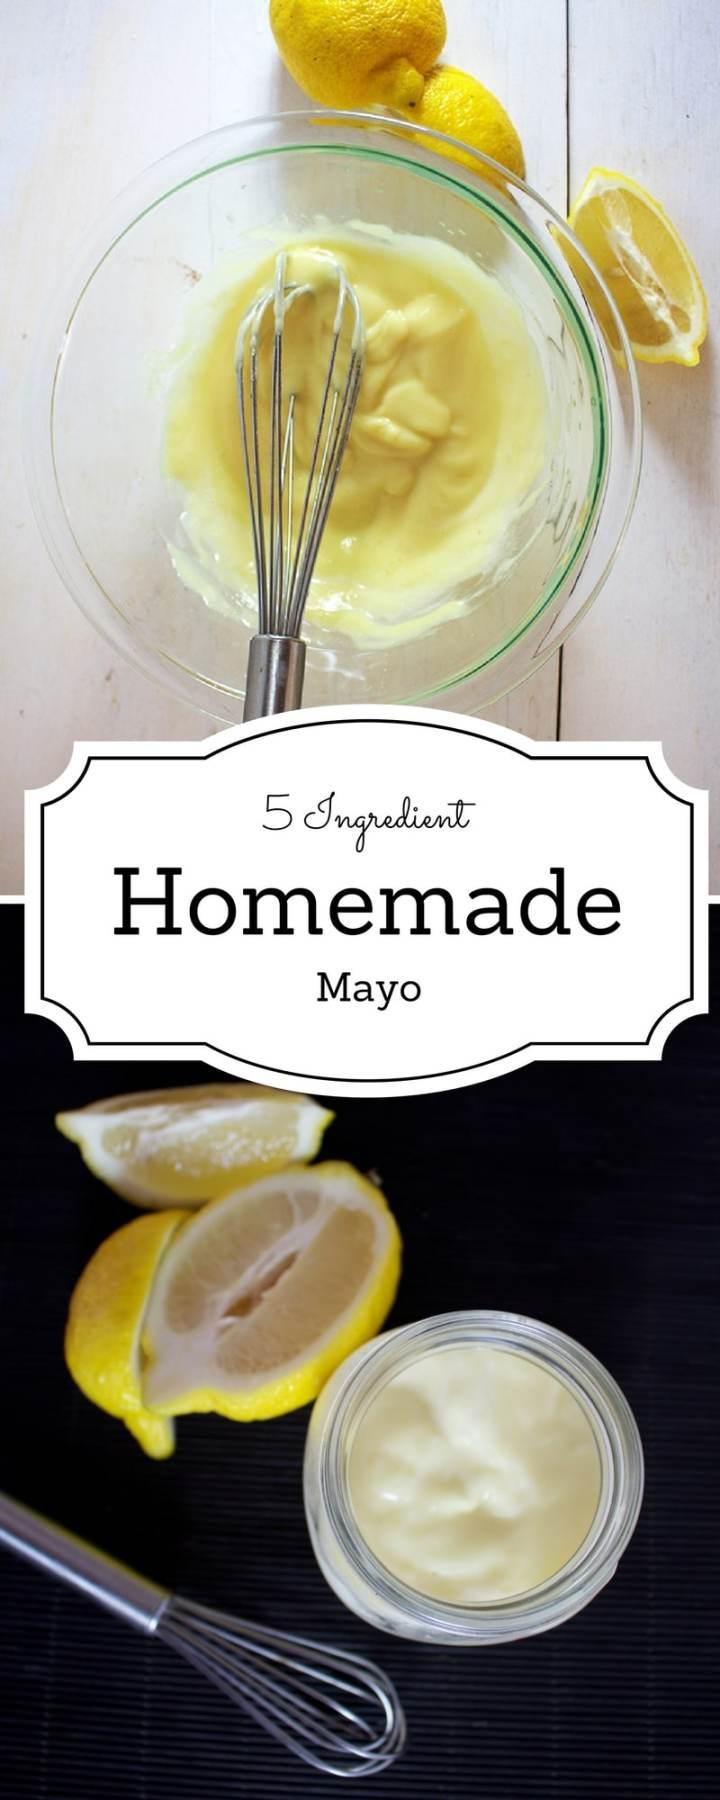 5 Ingredient Homemade Mayonnaise